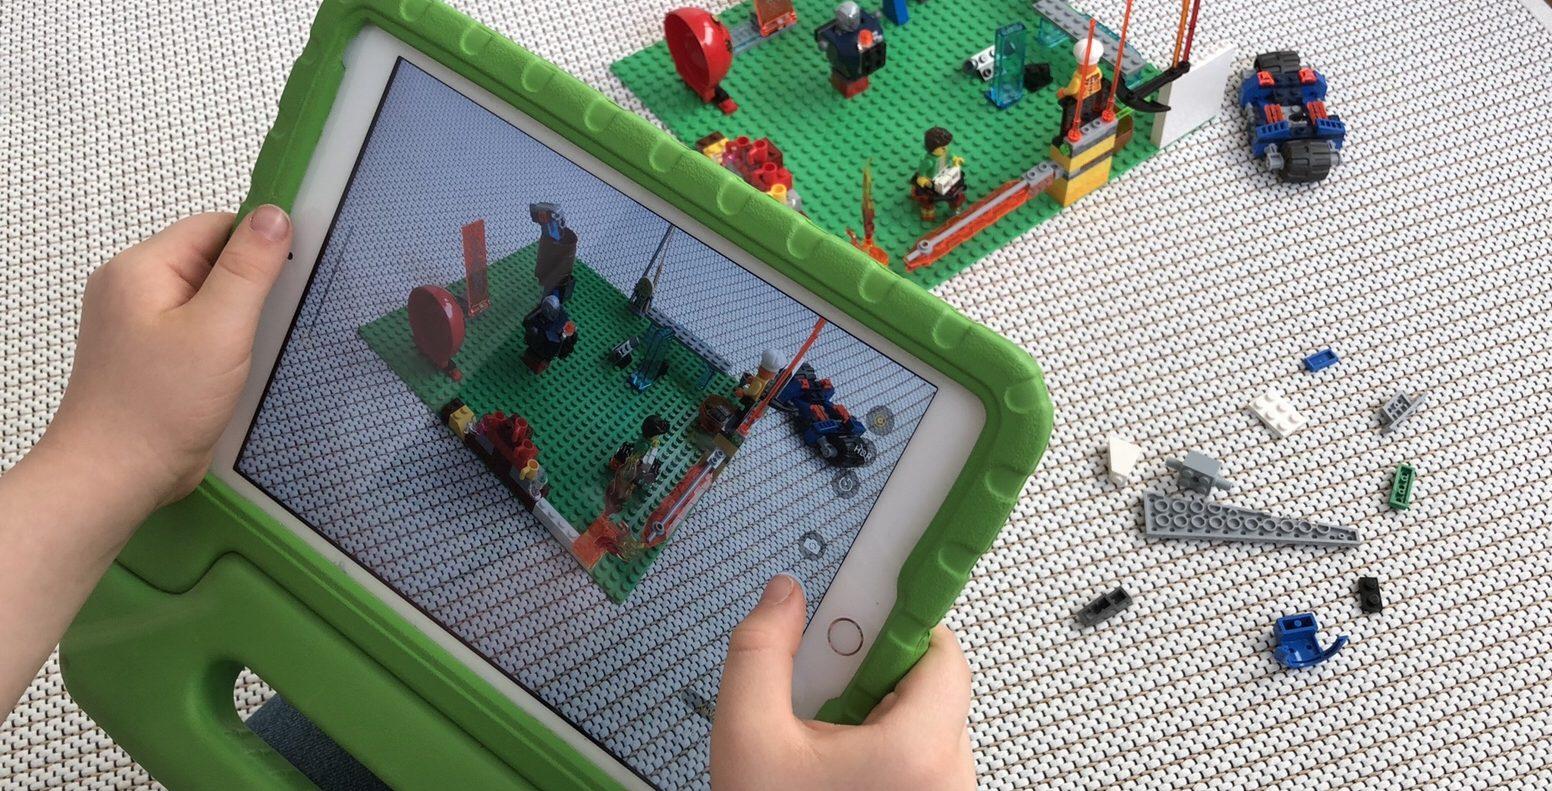 Lego-ohjeet ipadilla